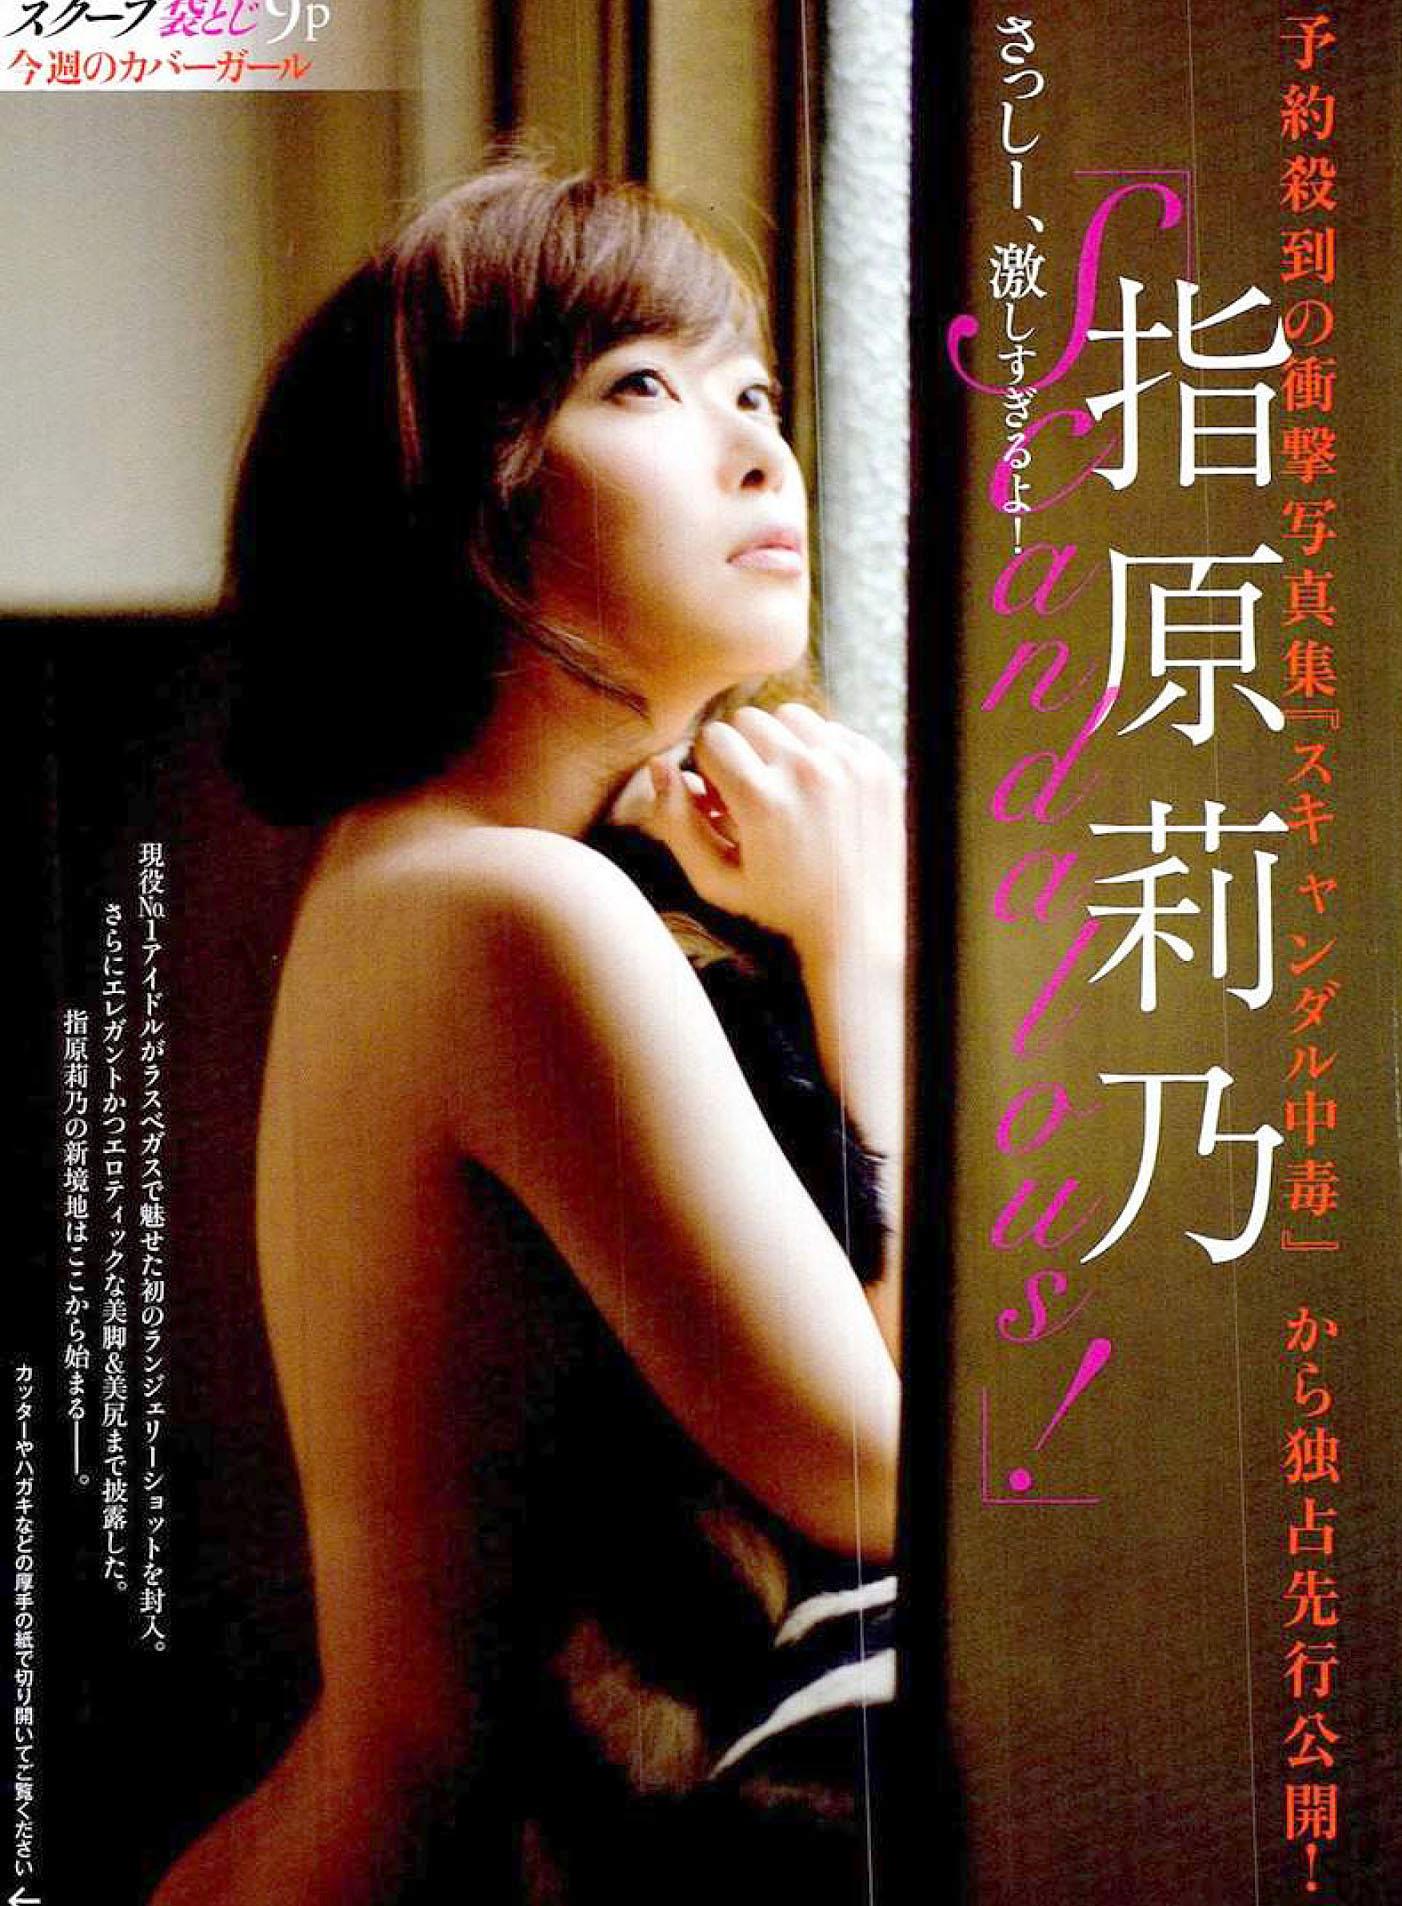 RSashihara Friday 160325 02.jpg